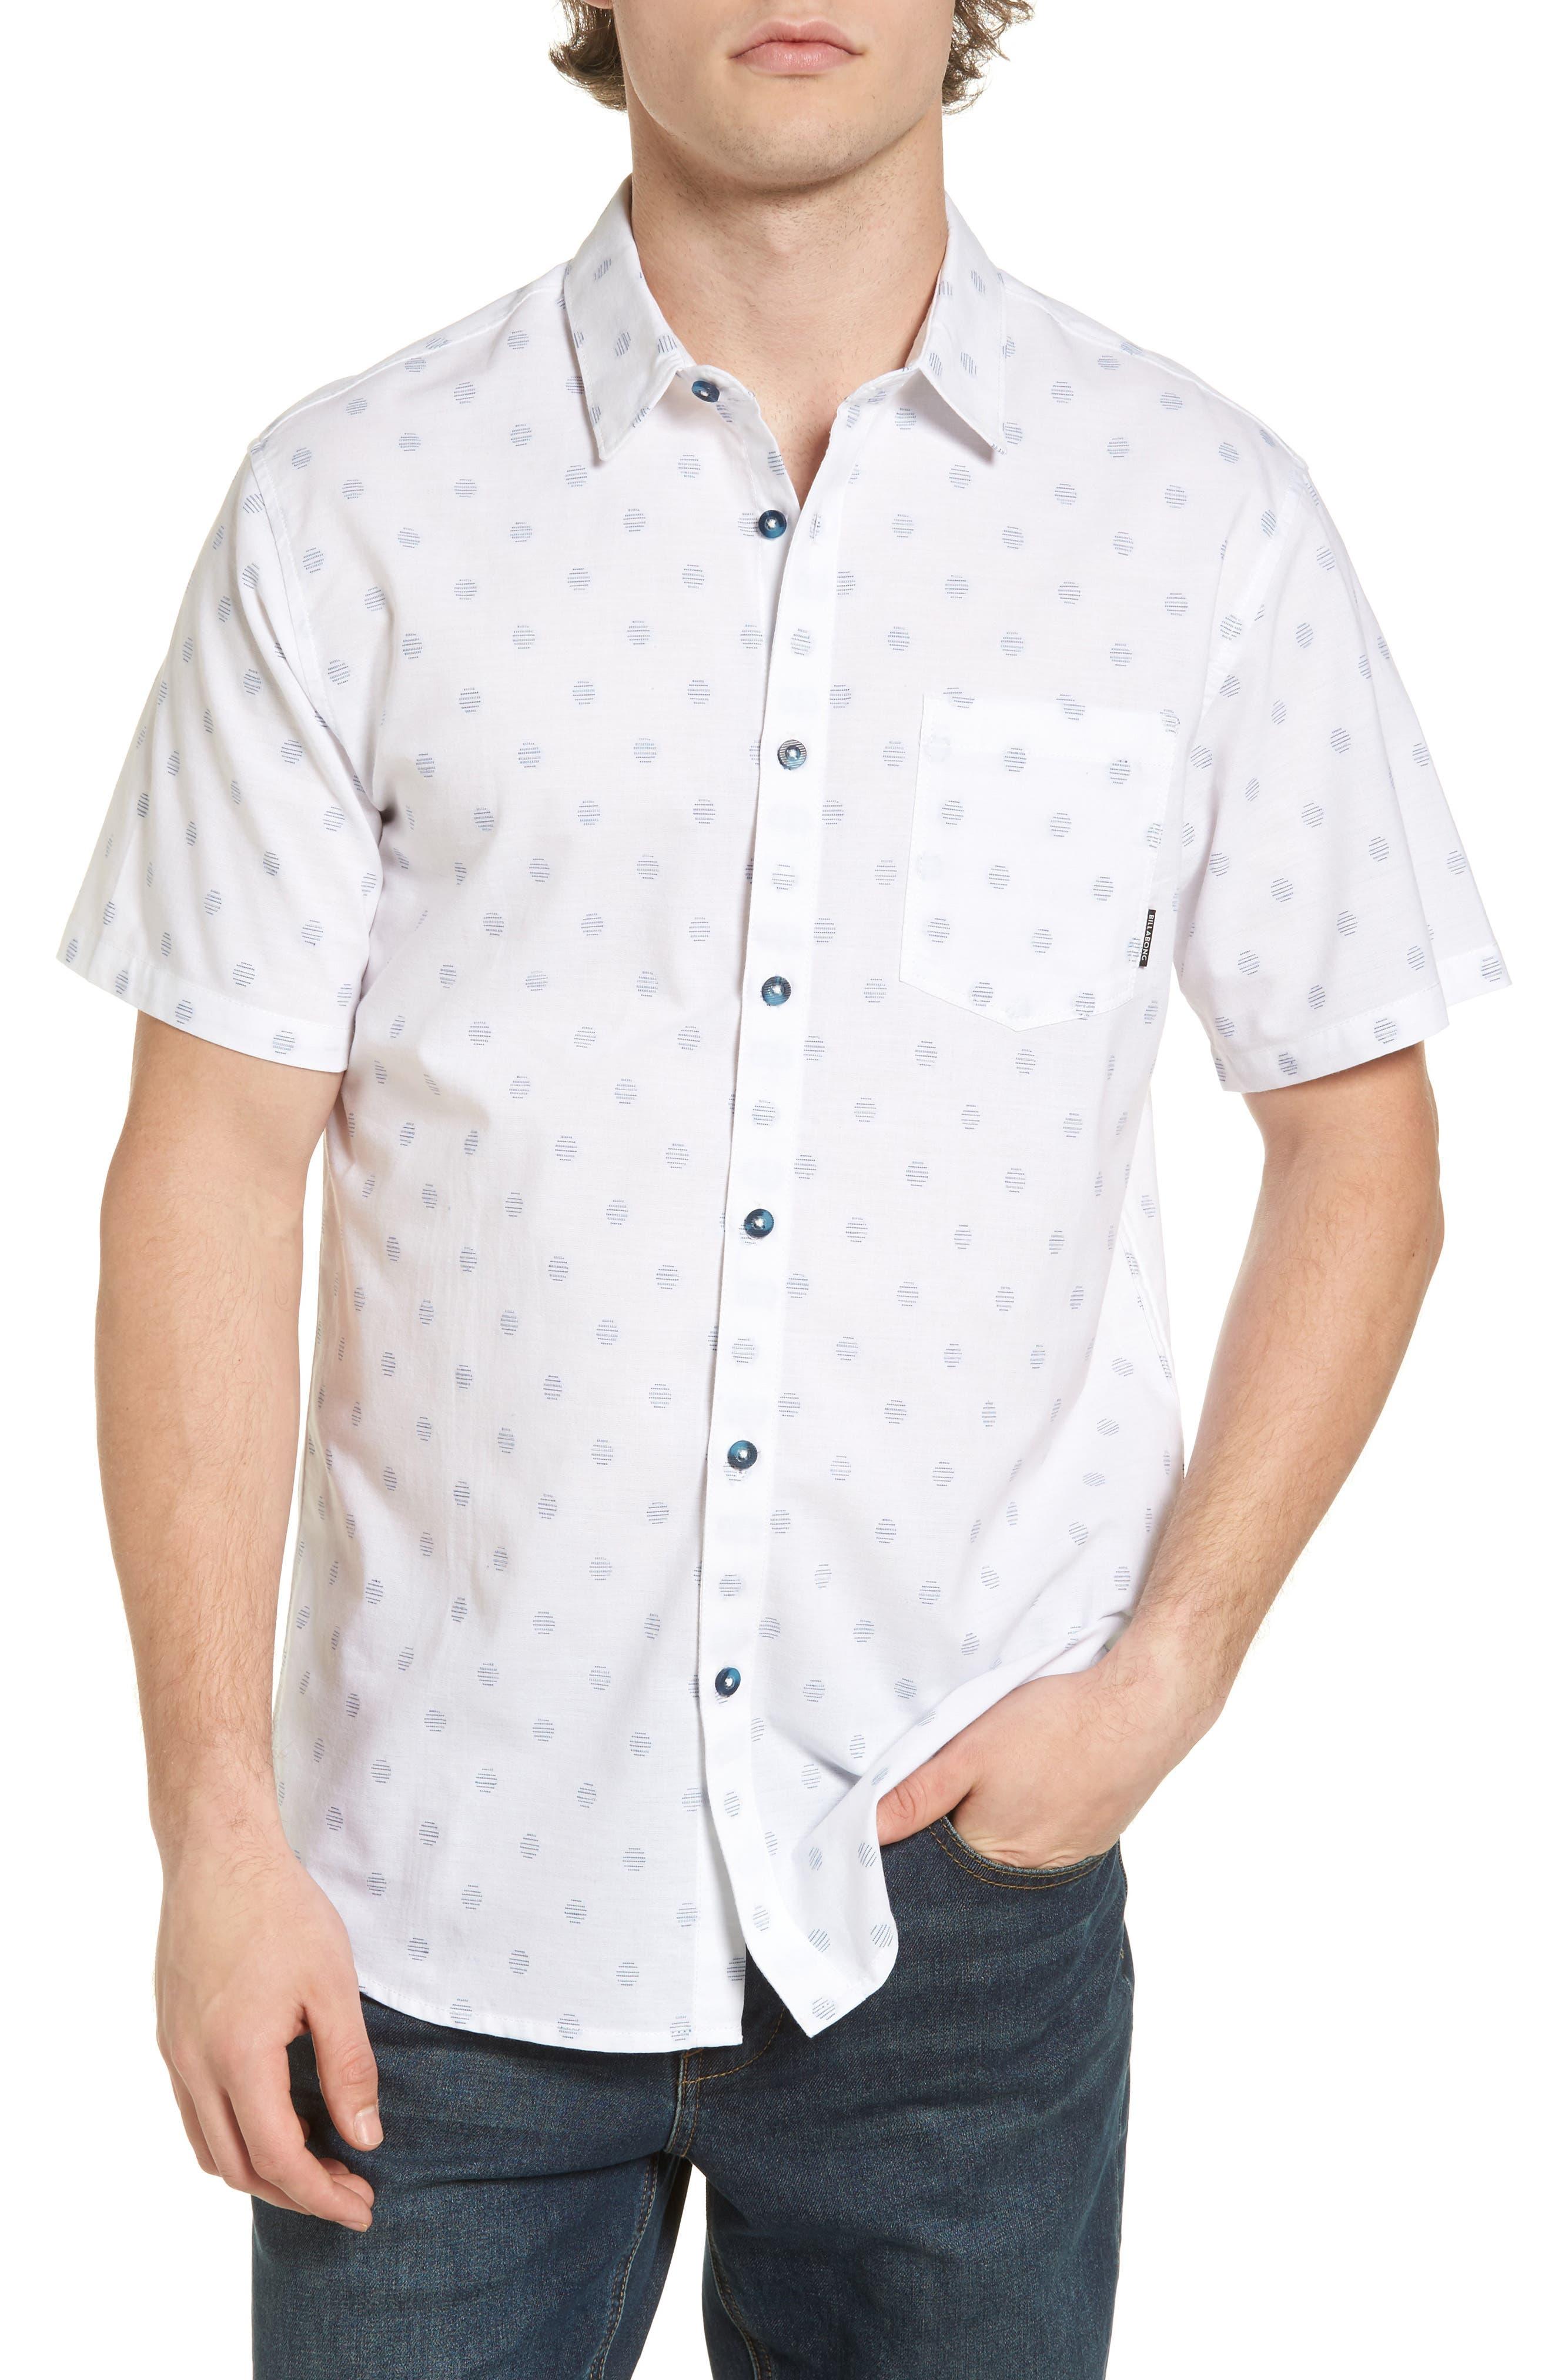 Alternate Image 1 Selected - Billabong Cruisin Dobby Woven Shirt